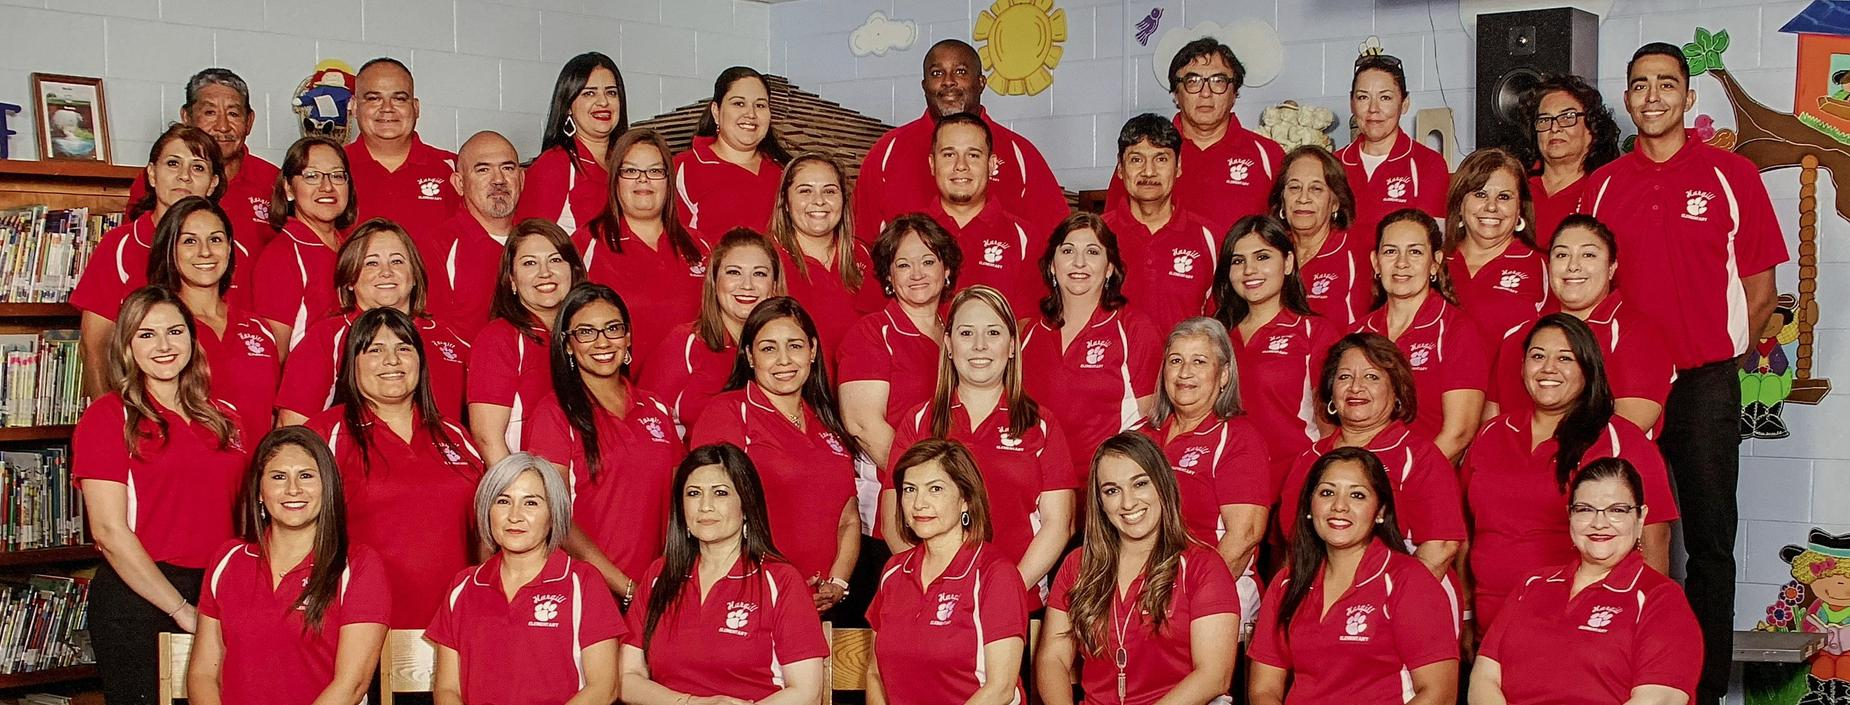 Hargill Elementary Staff